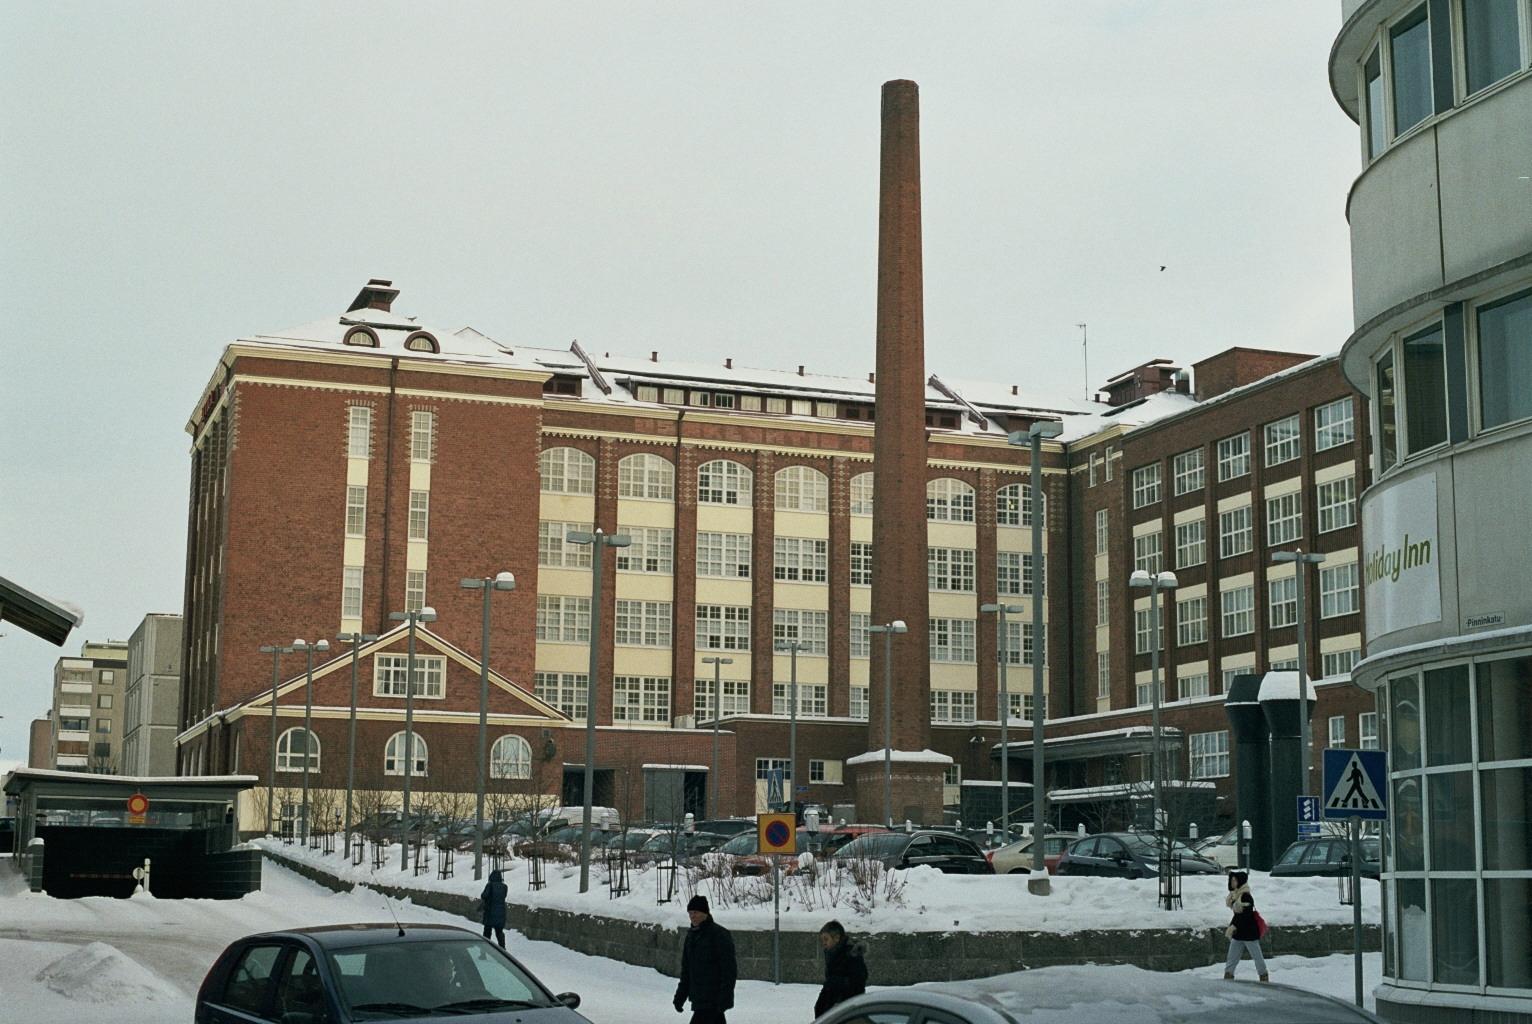 File:Former Attila shoe factory in